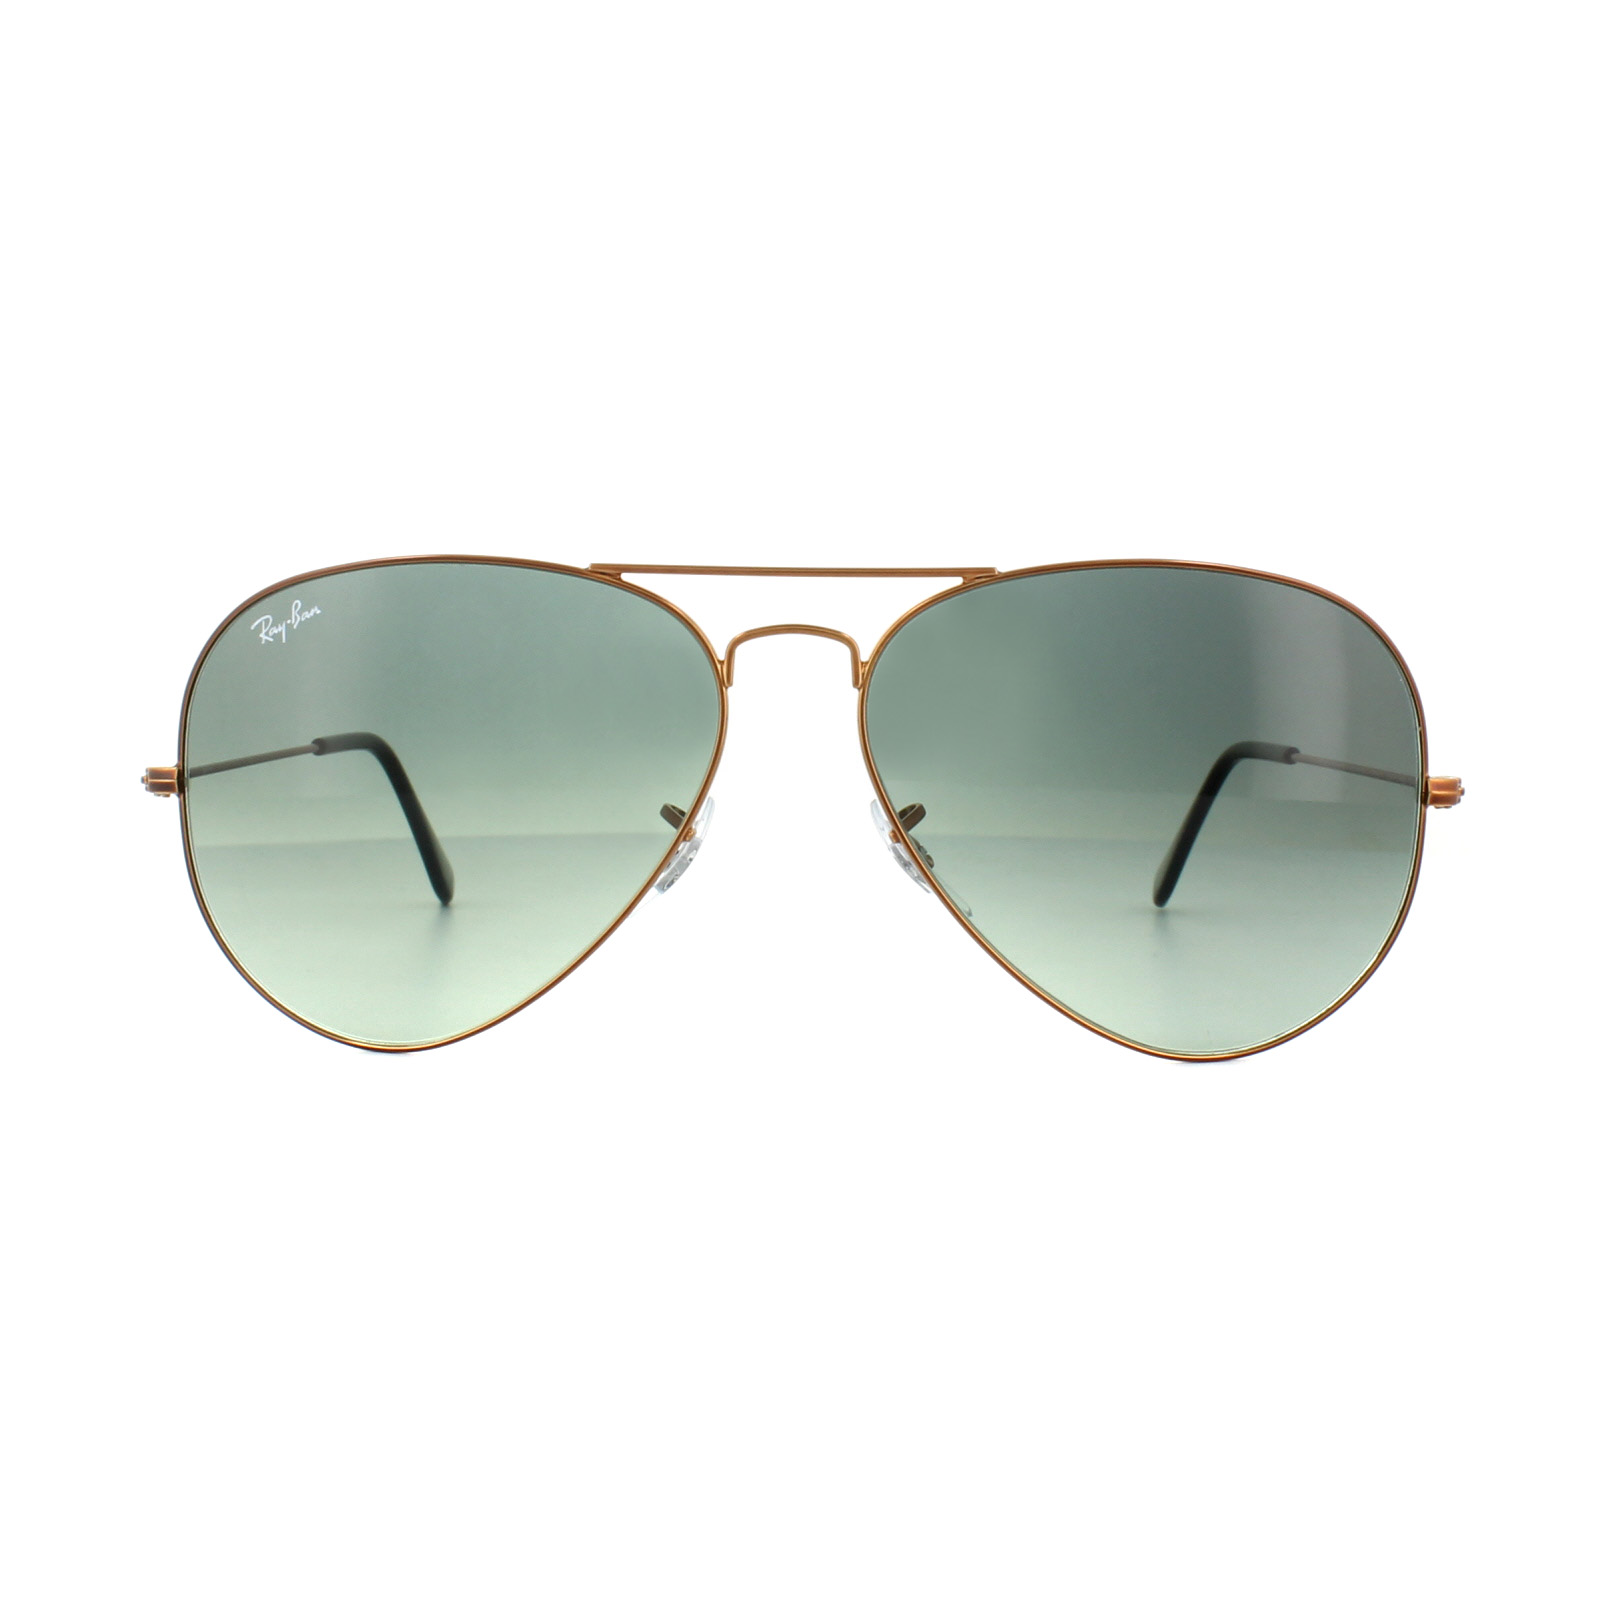 cec7ee80e37 Sentinel Ray-Ban Sunglasses Large Aviator 3026 197 71 Bronze Copper Grey  Gradient